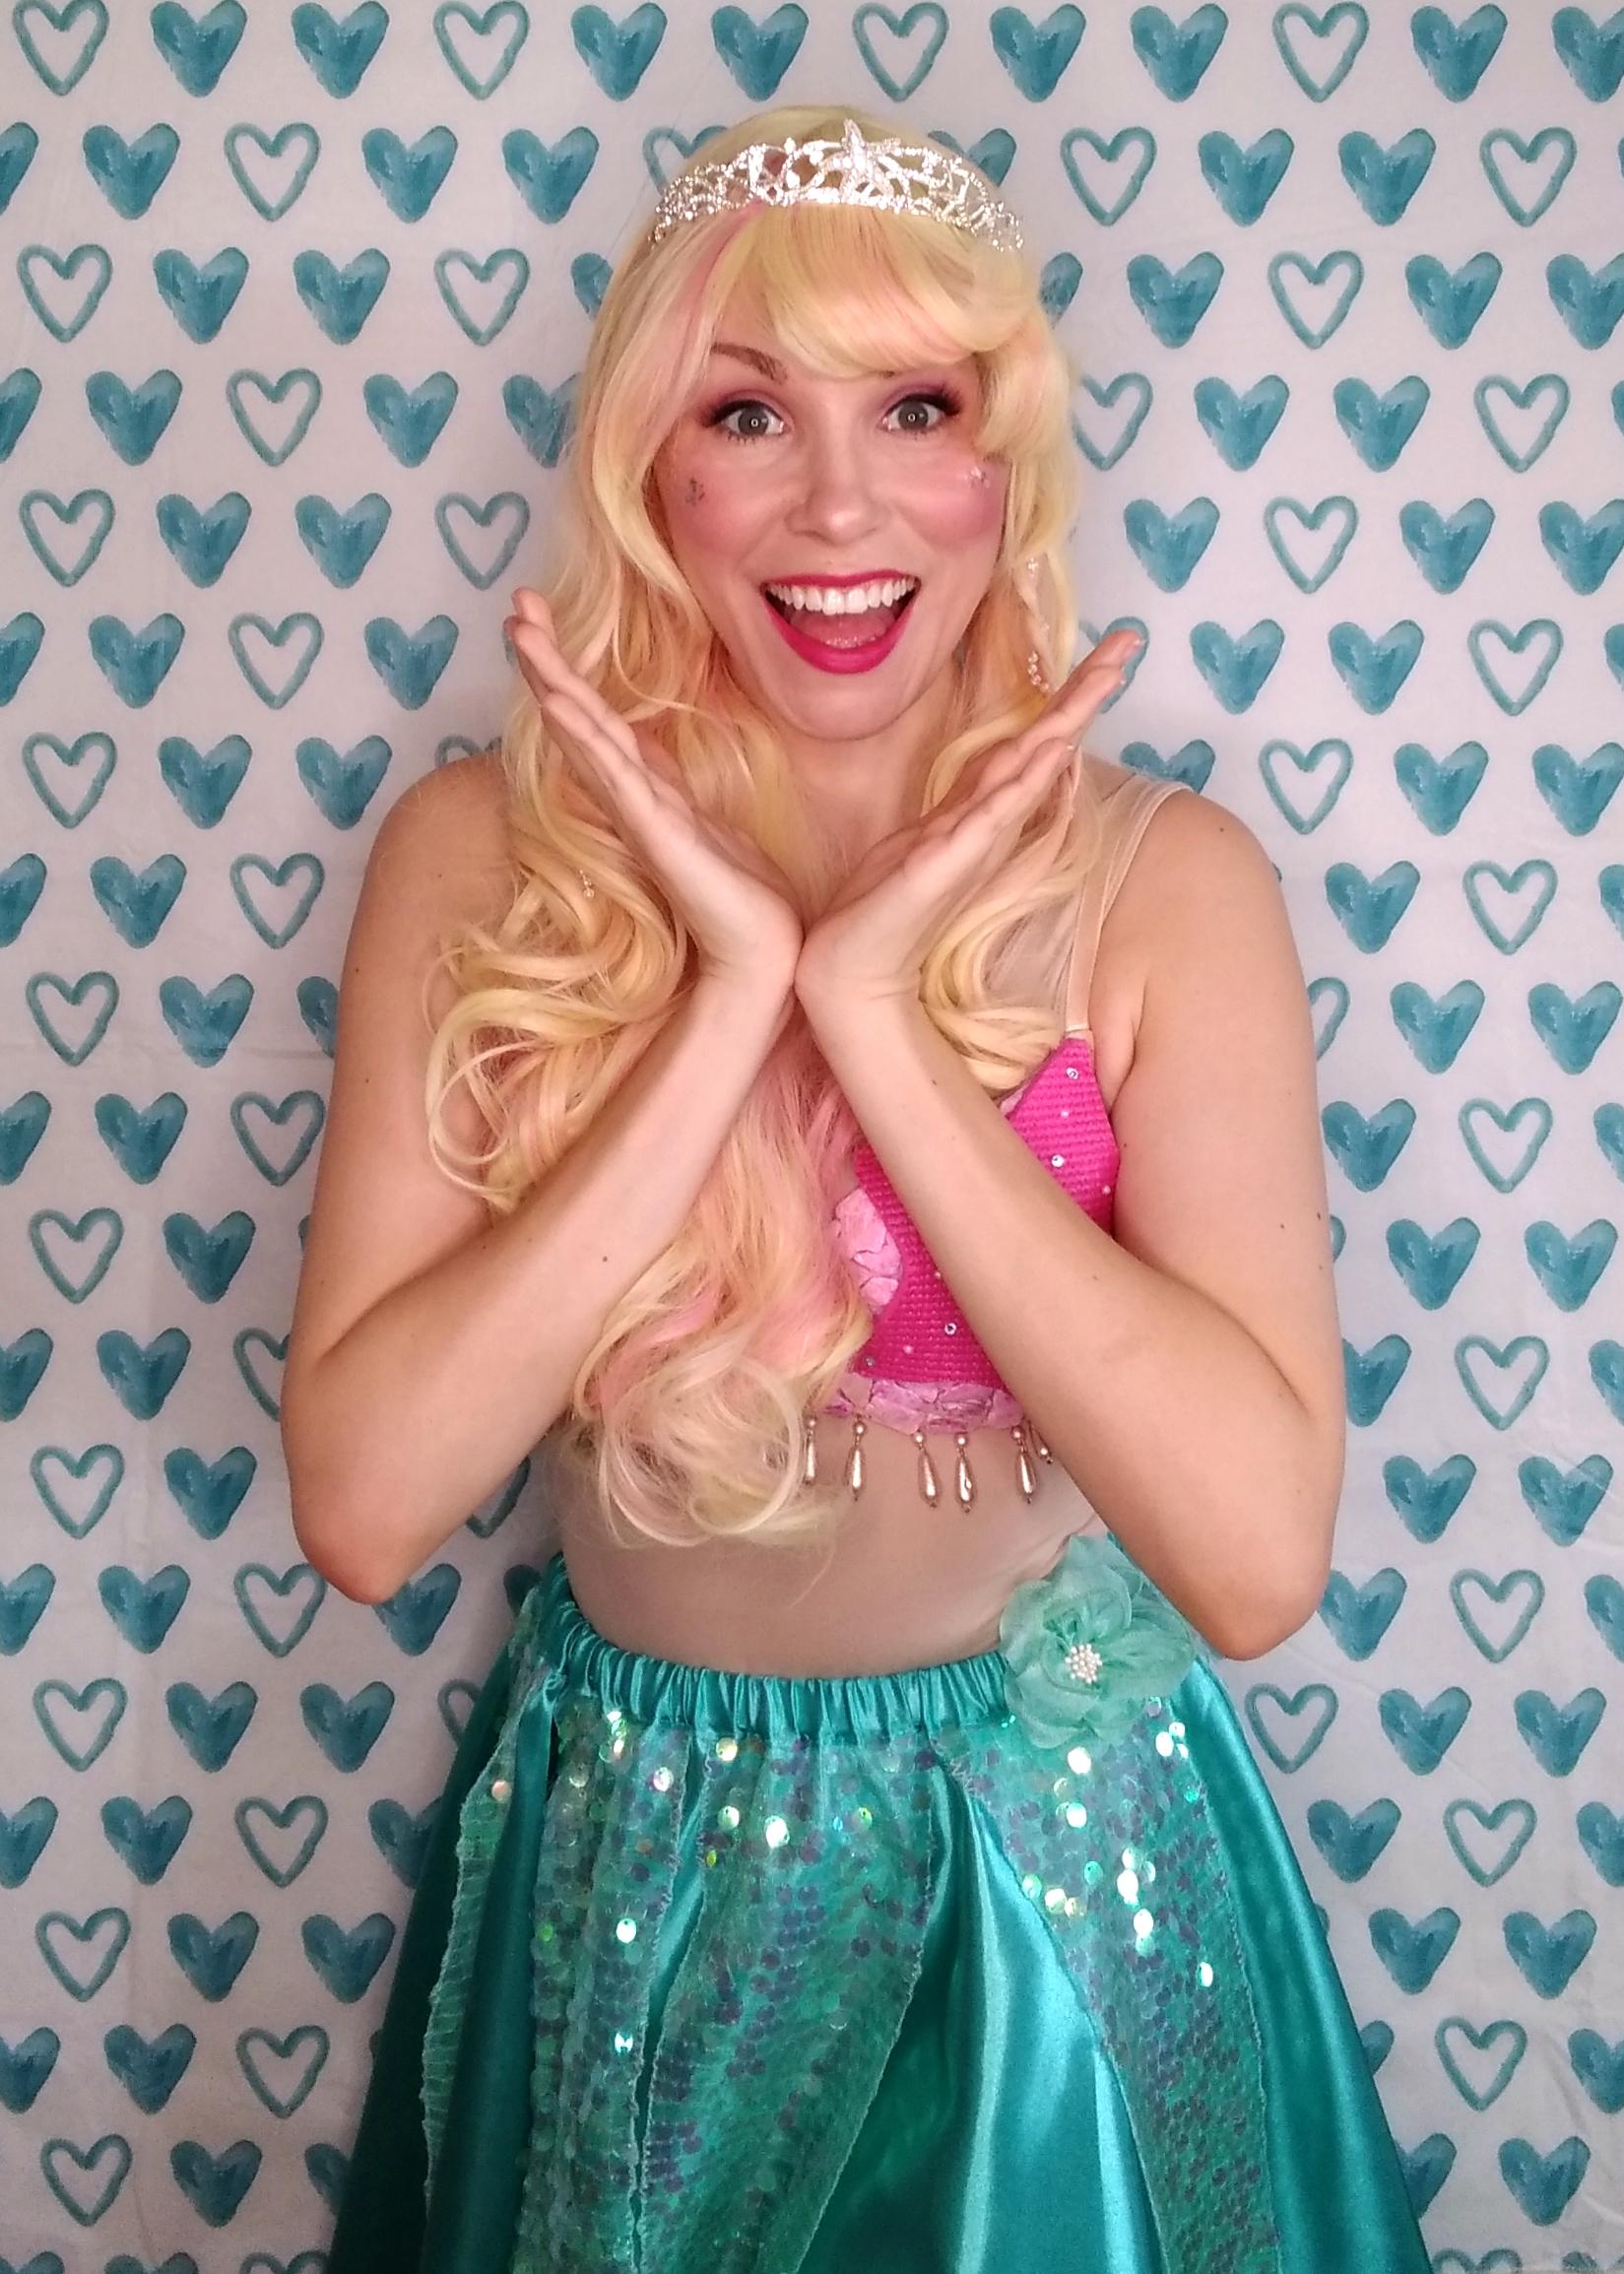 mermaid princess hearts 2 once upon a pr